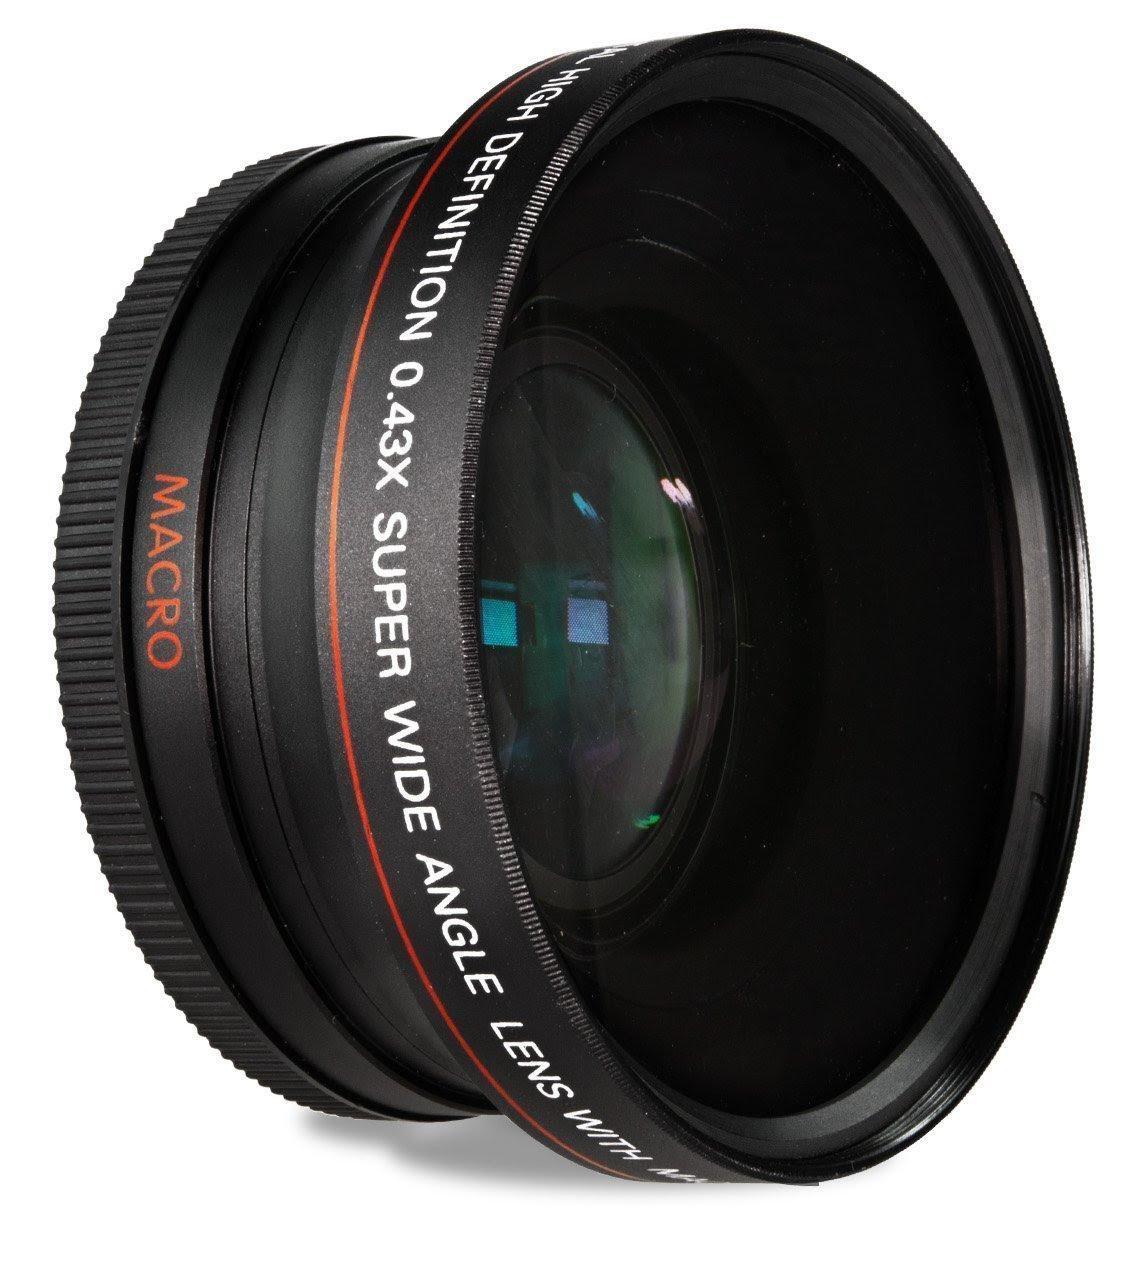 Top 10 Best Macro Close Up Lenses For Digital Cameras Reviews 2018